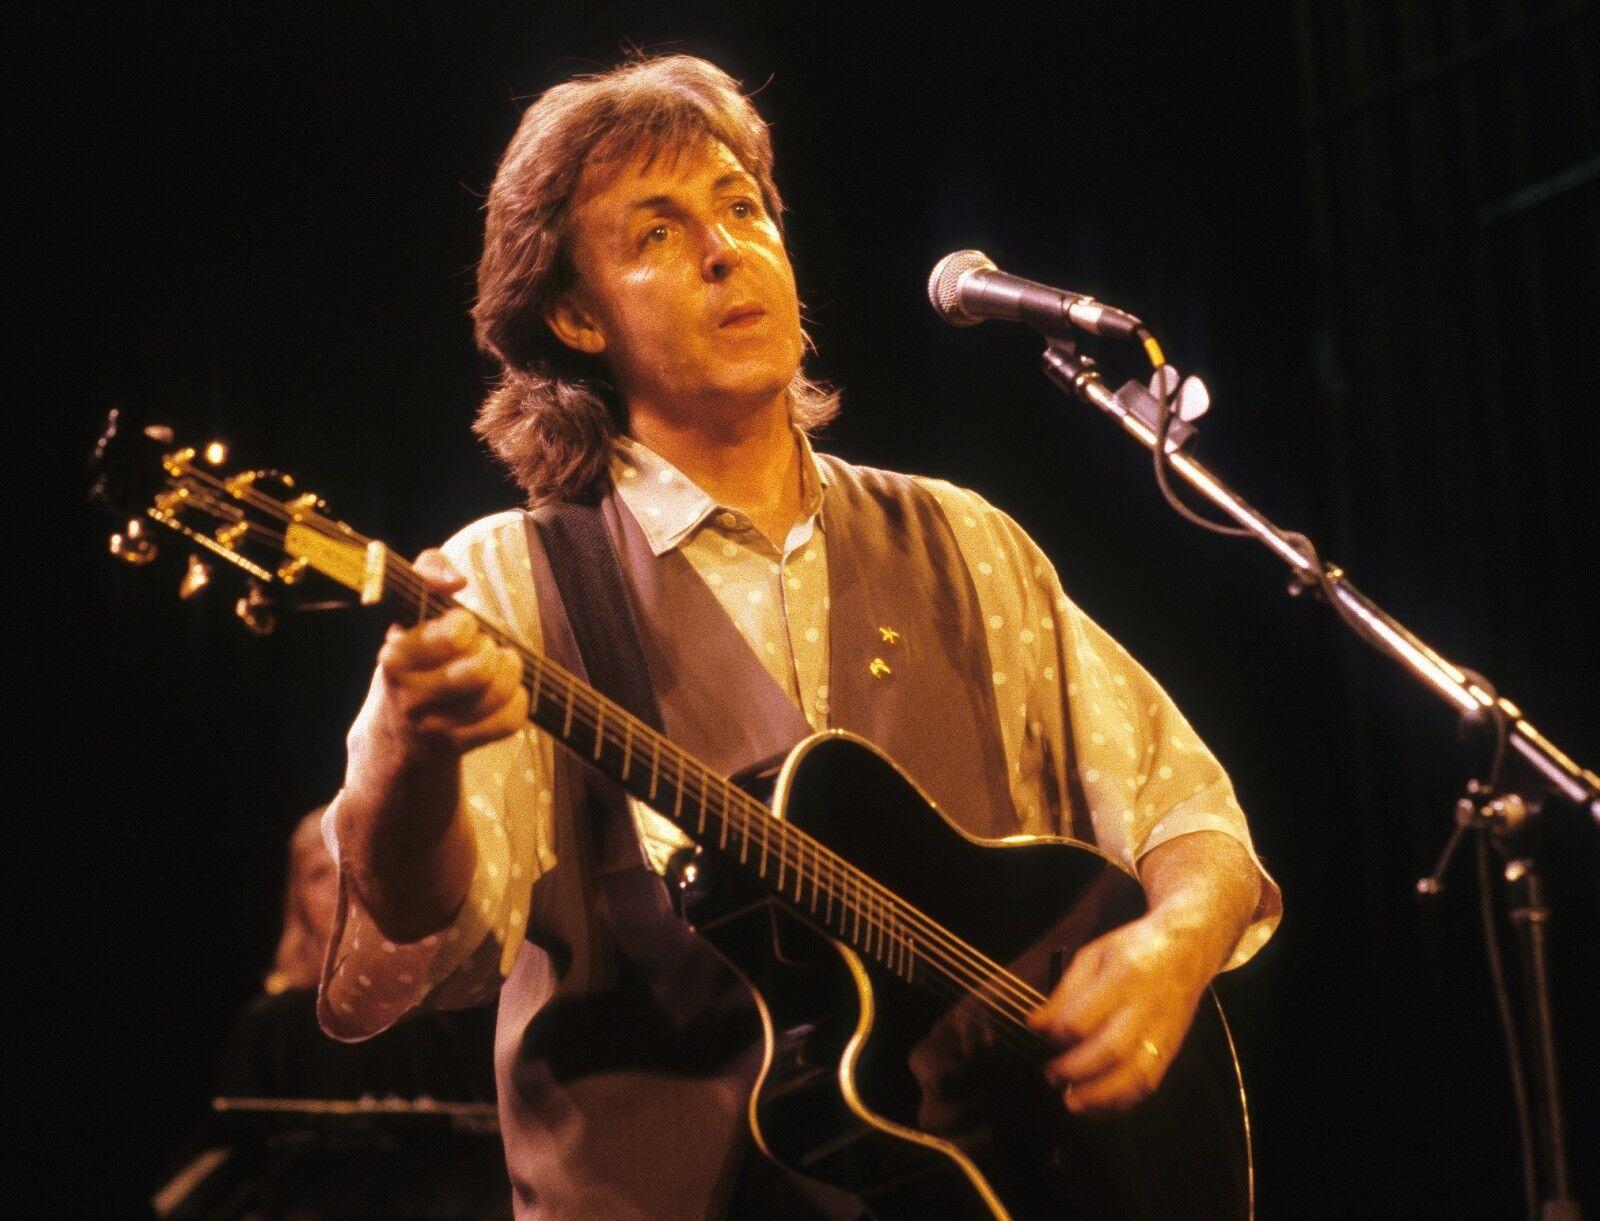 Paul McCartney House Pictures - m Paul mccartney photos for sale